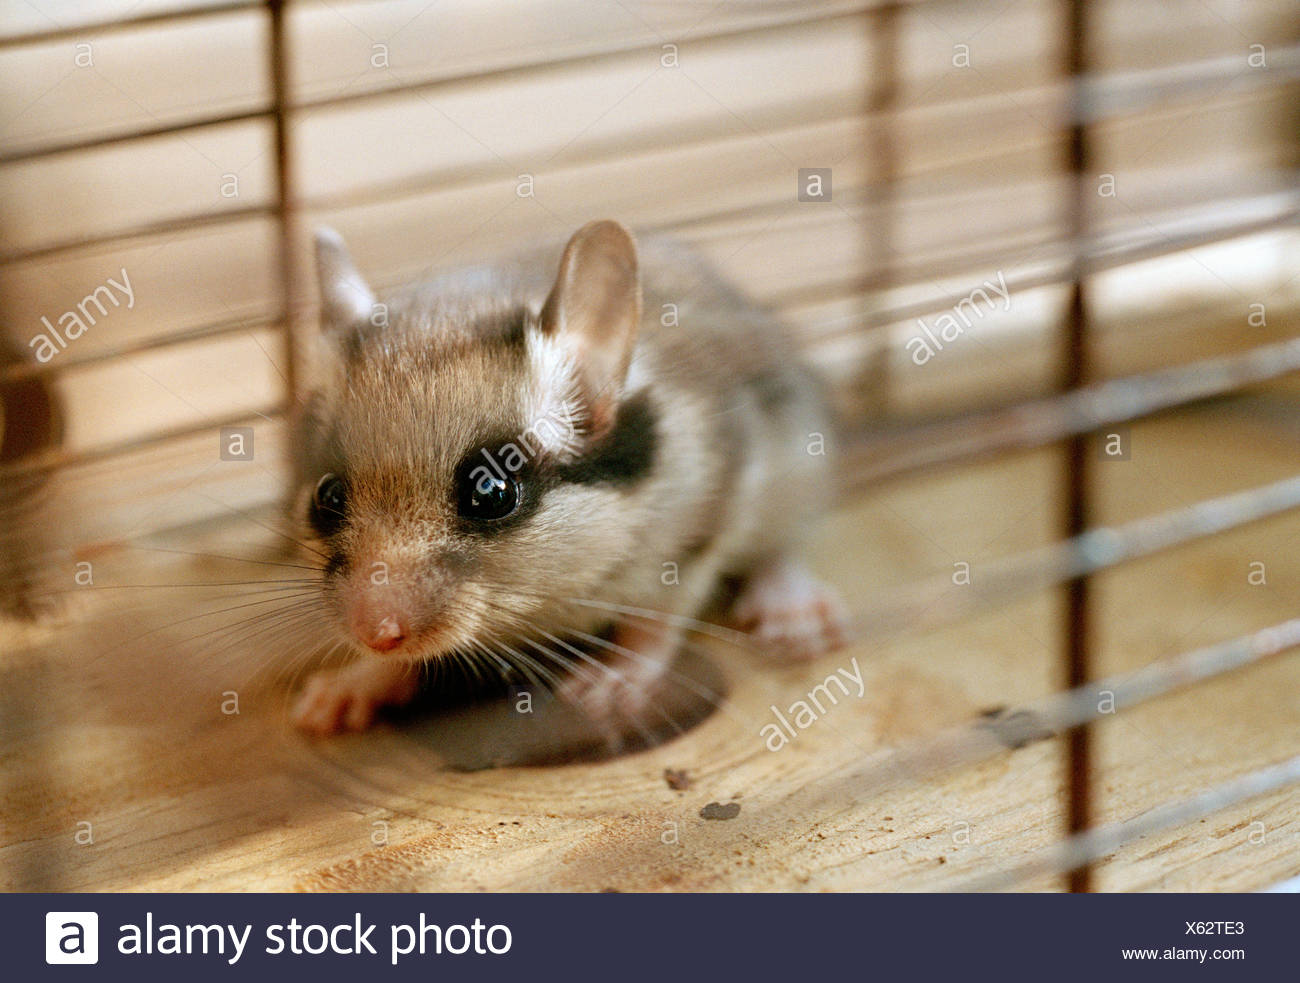 Haustier Maus